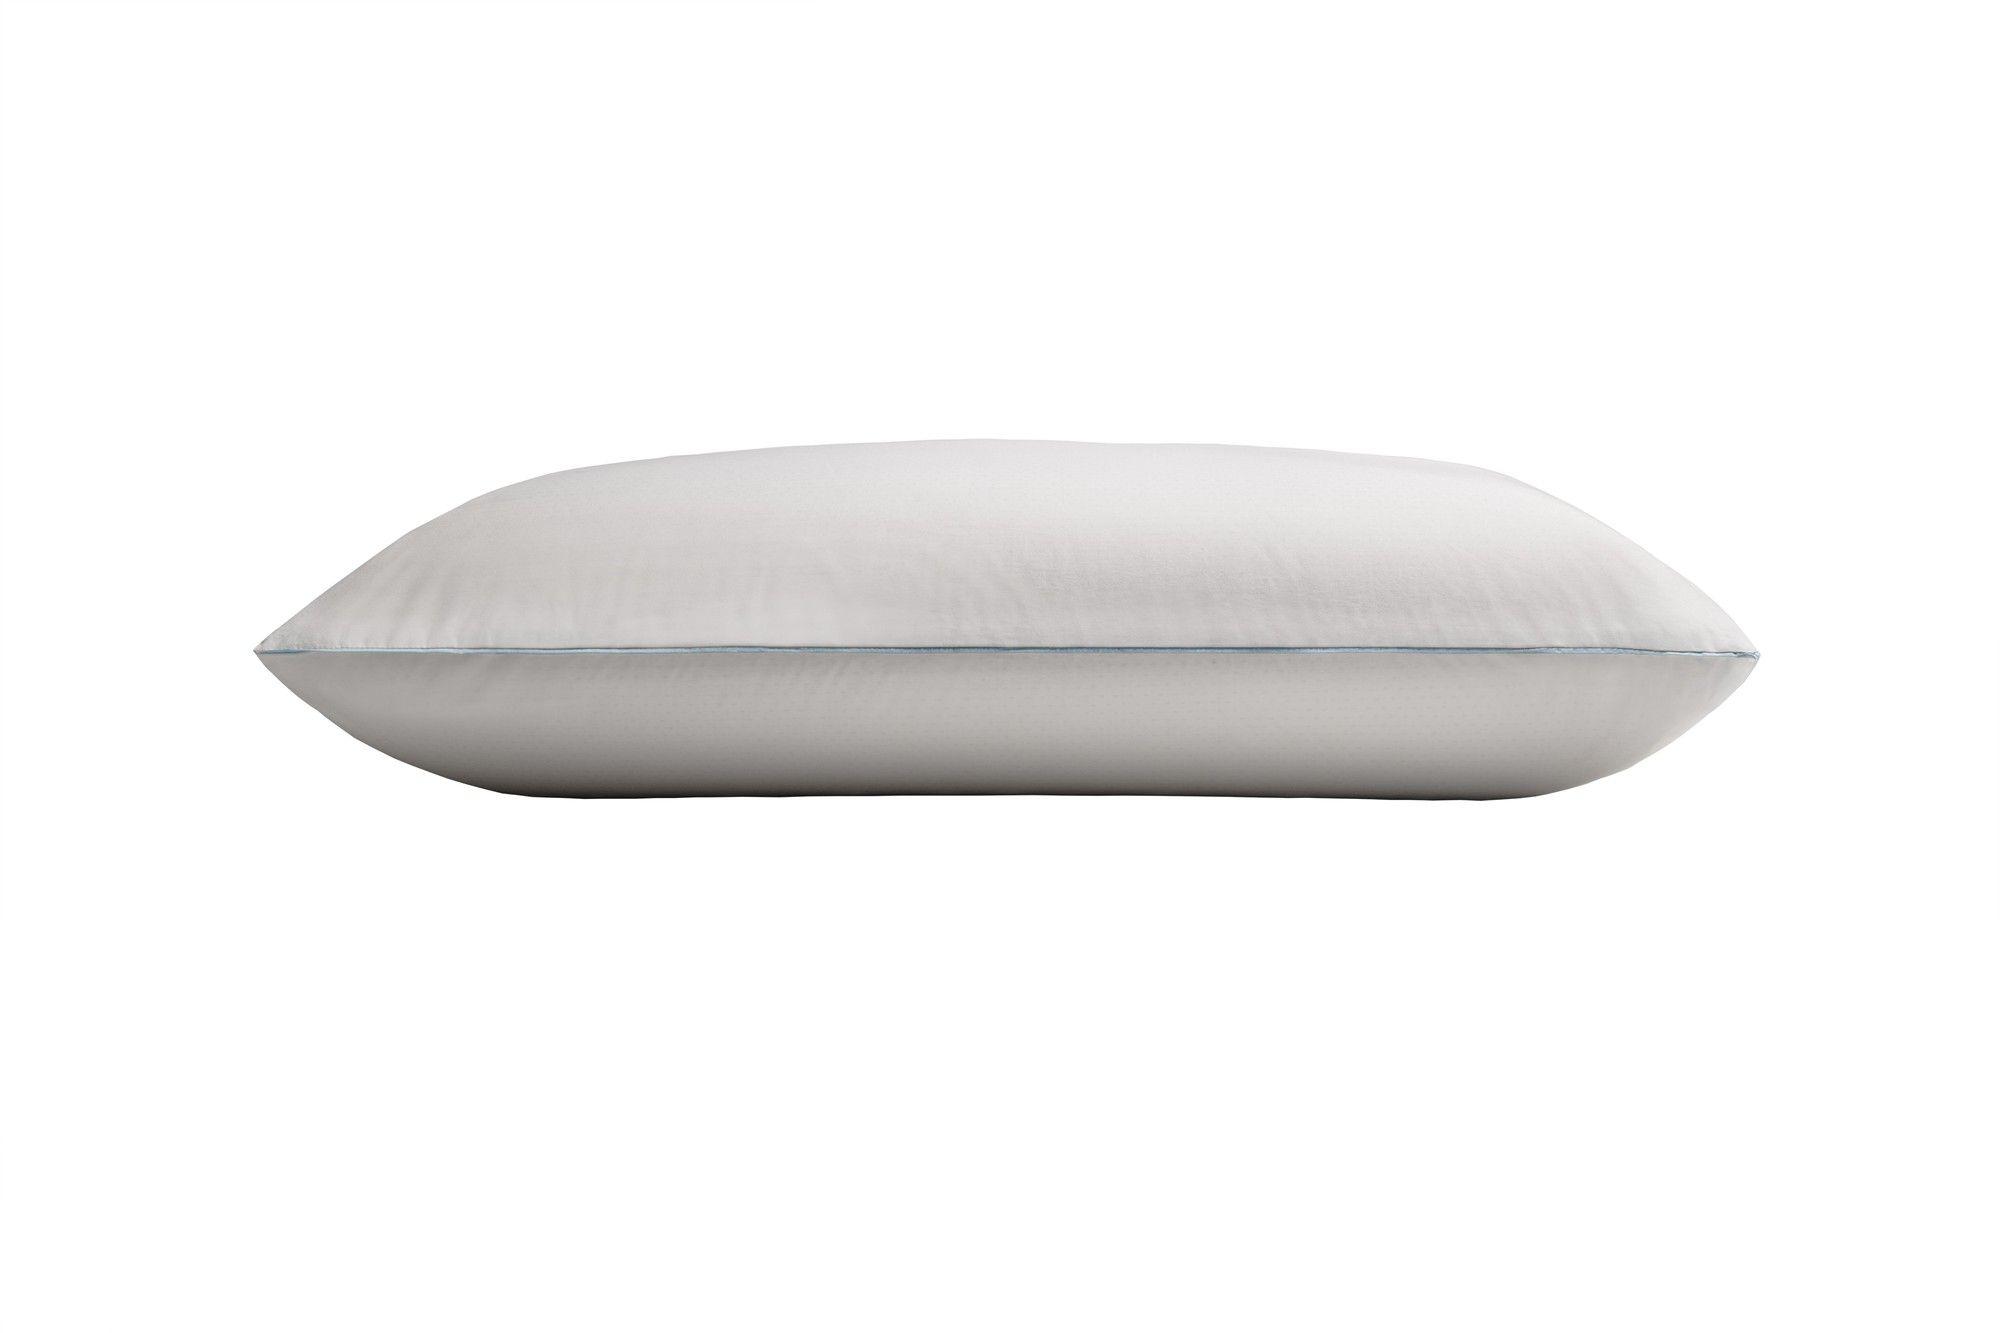 Tempur Cloud Breeze Dual Cooling Tempurpedic Tempurpedic Mattress Best Pillow Tempurpedic pillow cloud breeze dual cooling